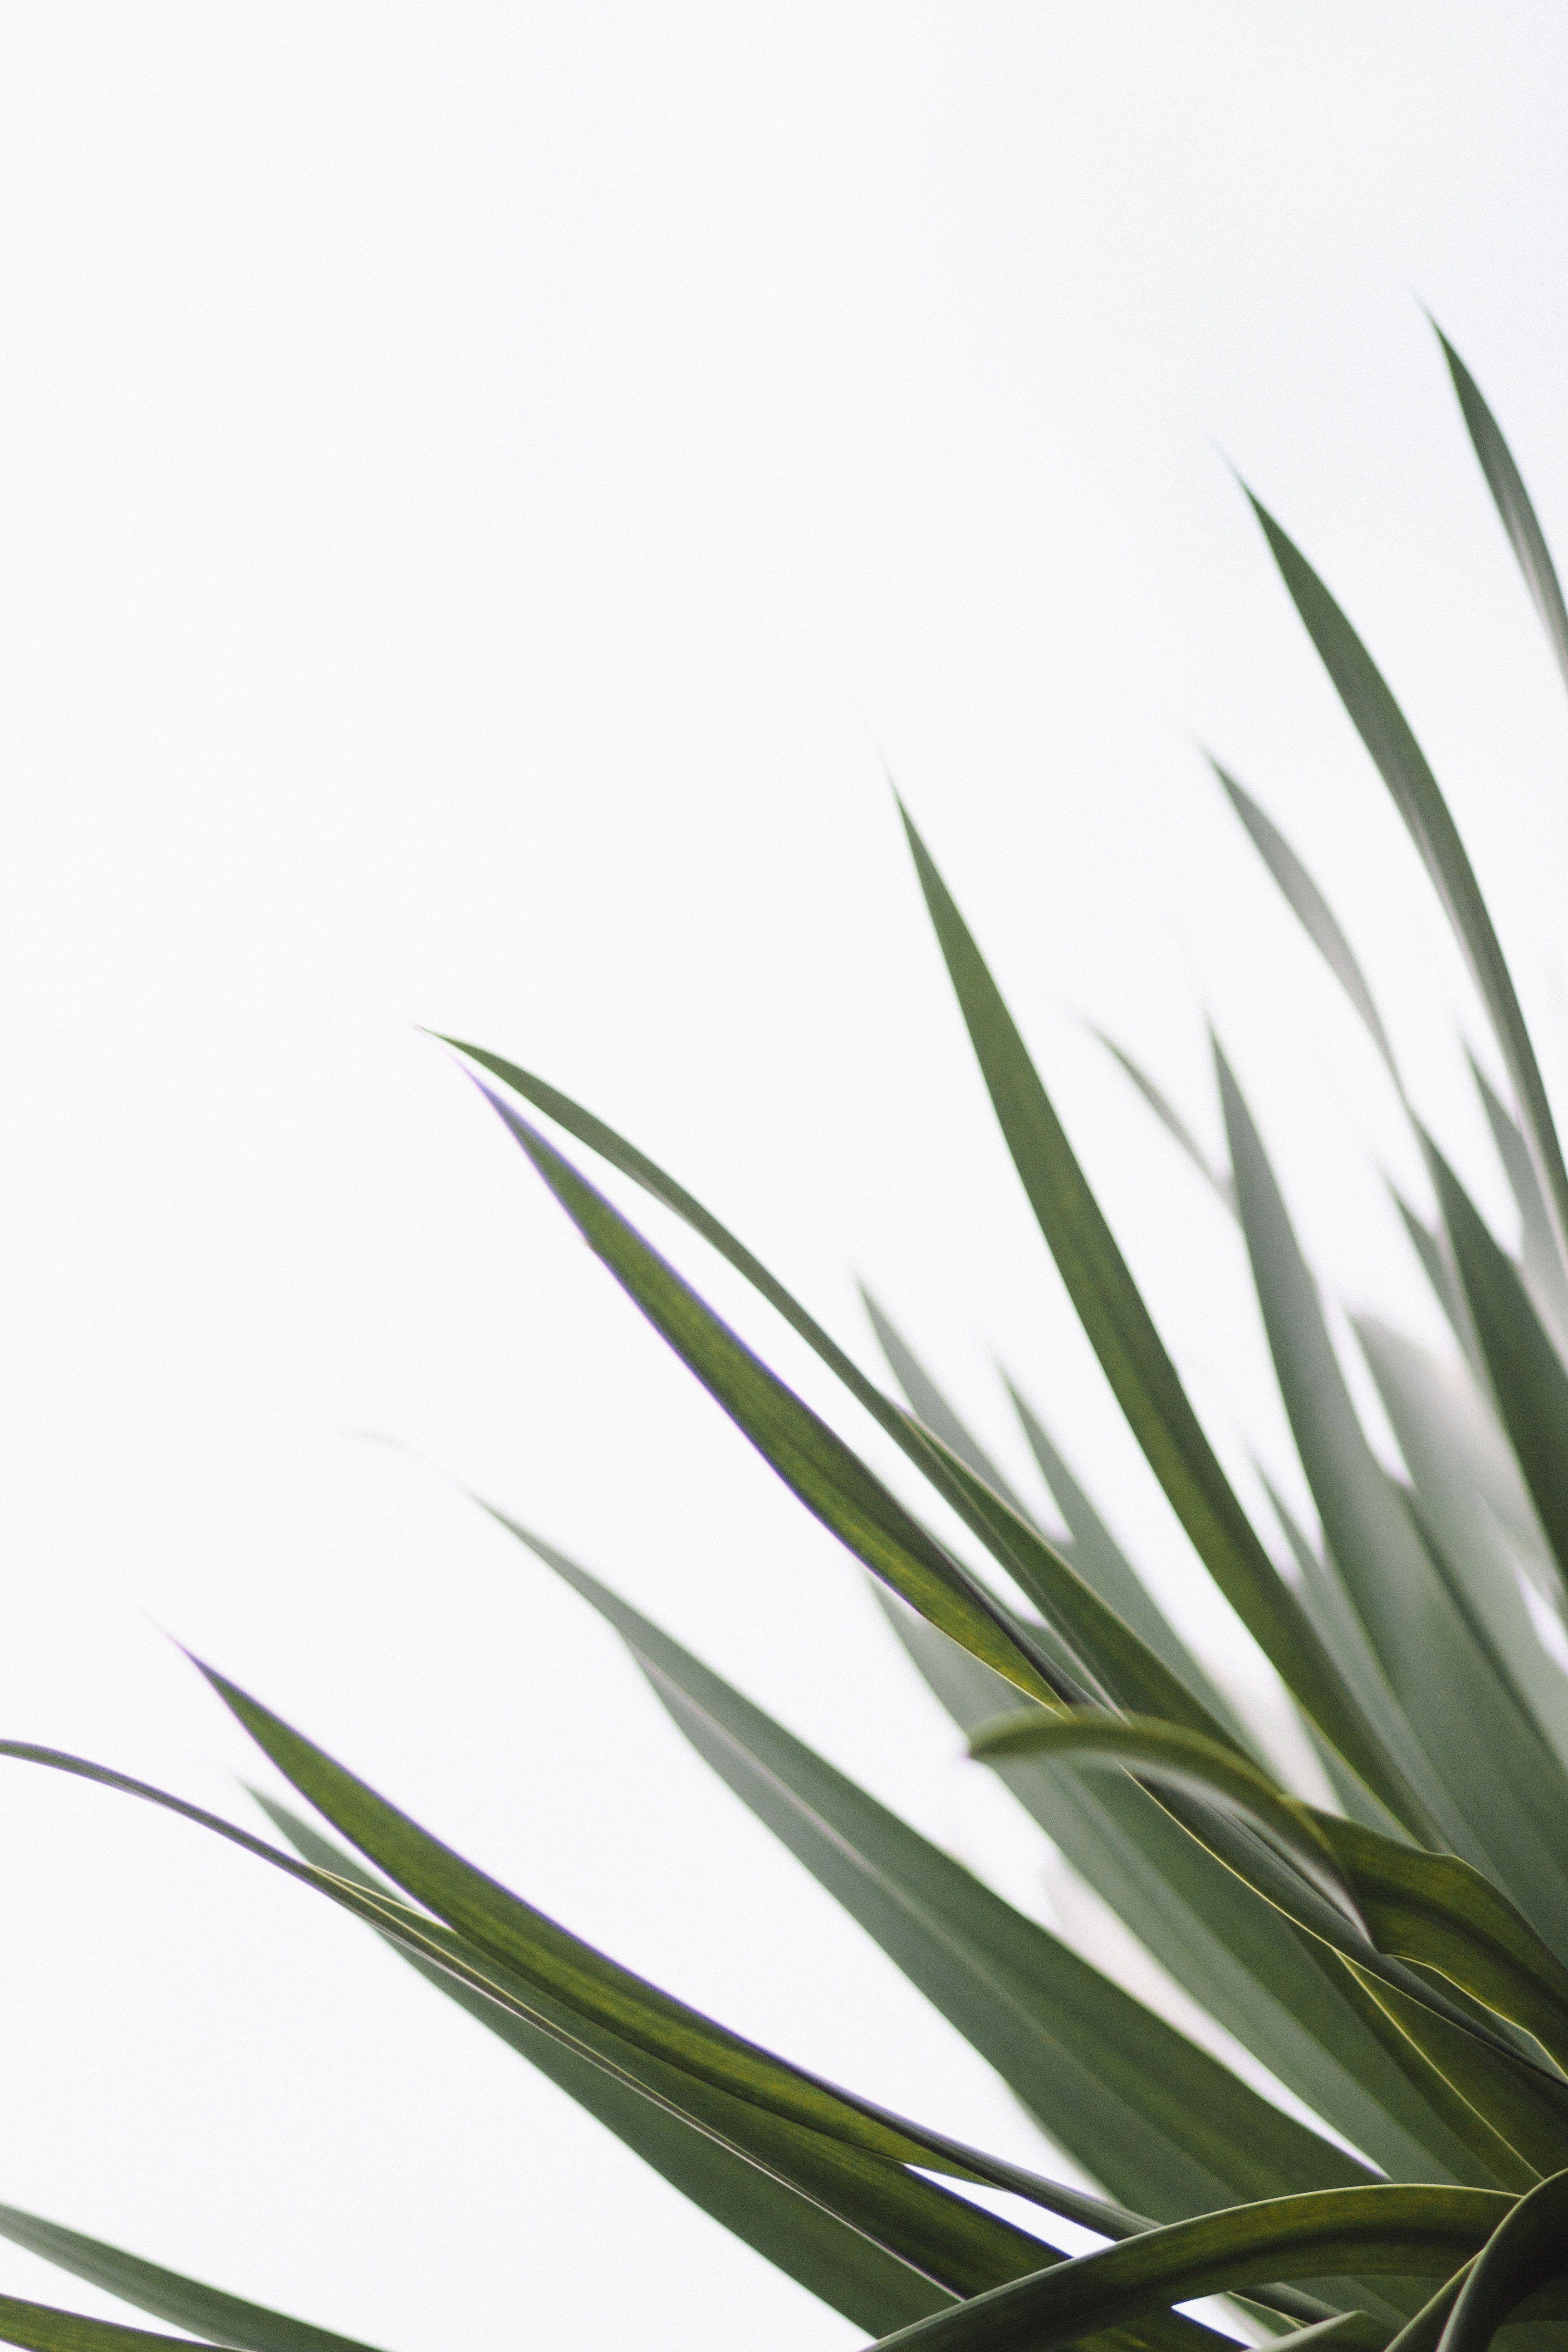 Custom Orders In 2020 Minimalist Wallpaper Plant Images Green Leaves